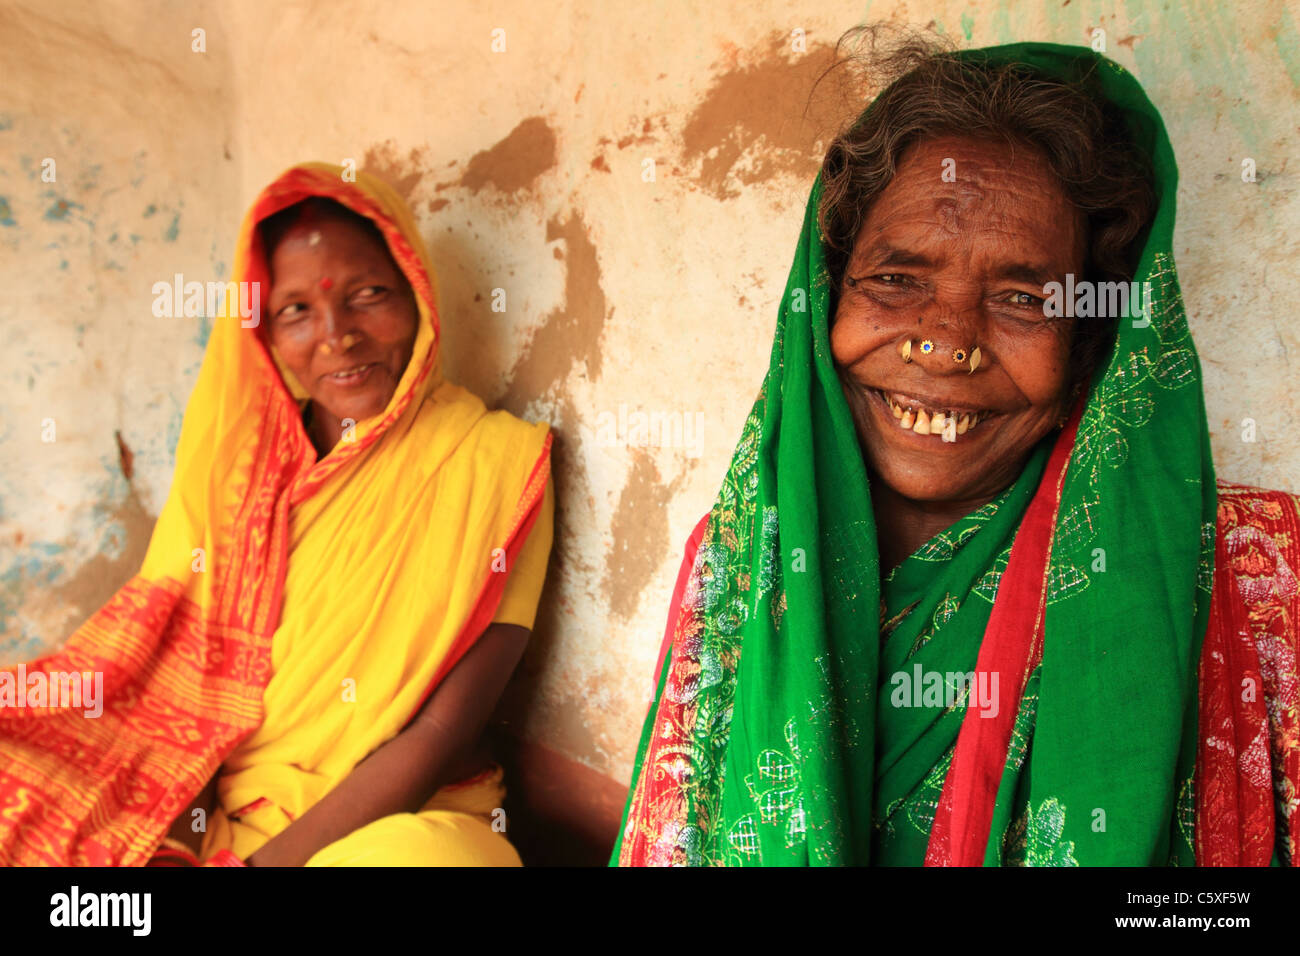 indian tribal women  Indian tribal women laughing Stock Photo: 38076693 - Alamy